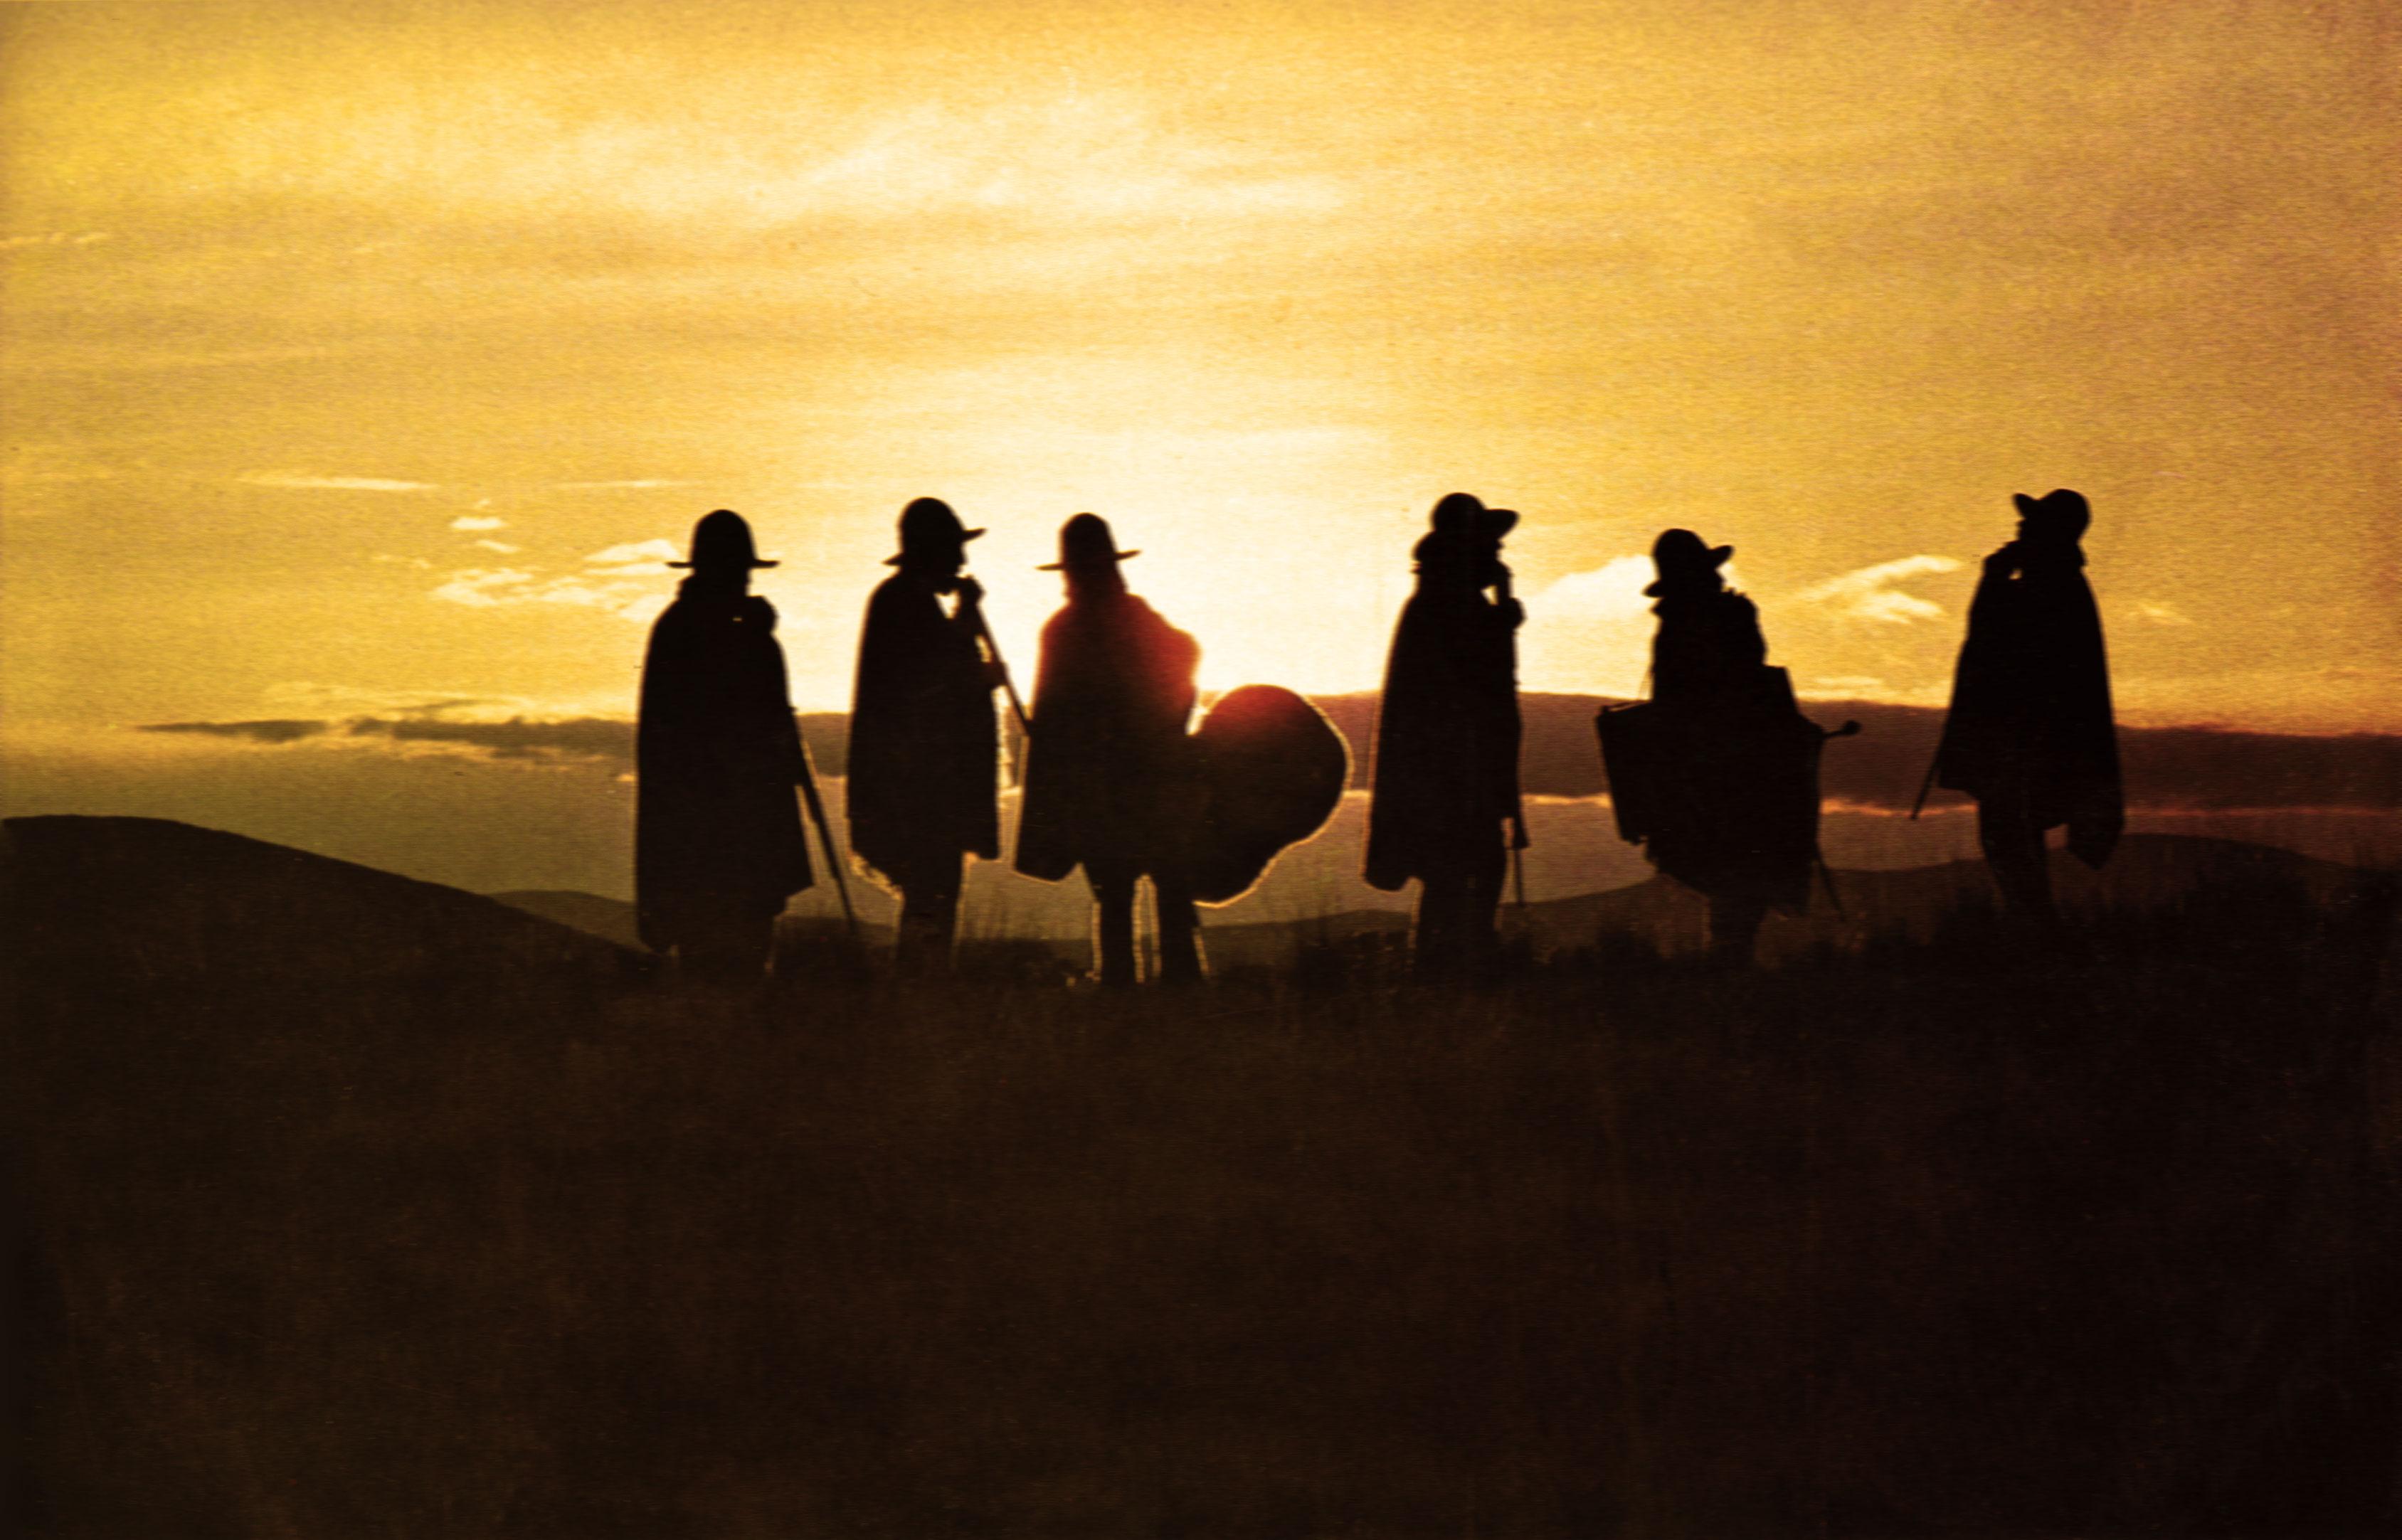 Ruphay im Altiplano am Abend - Pressefoto